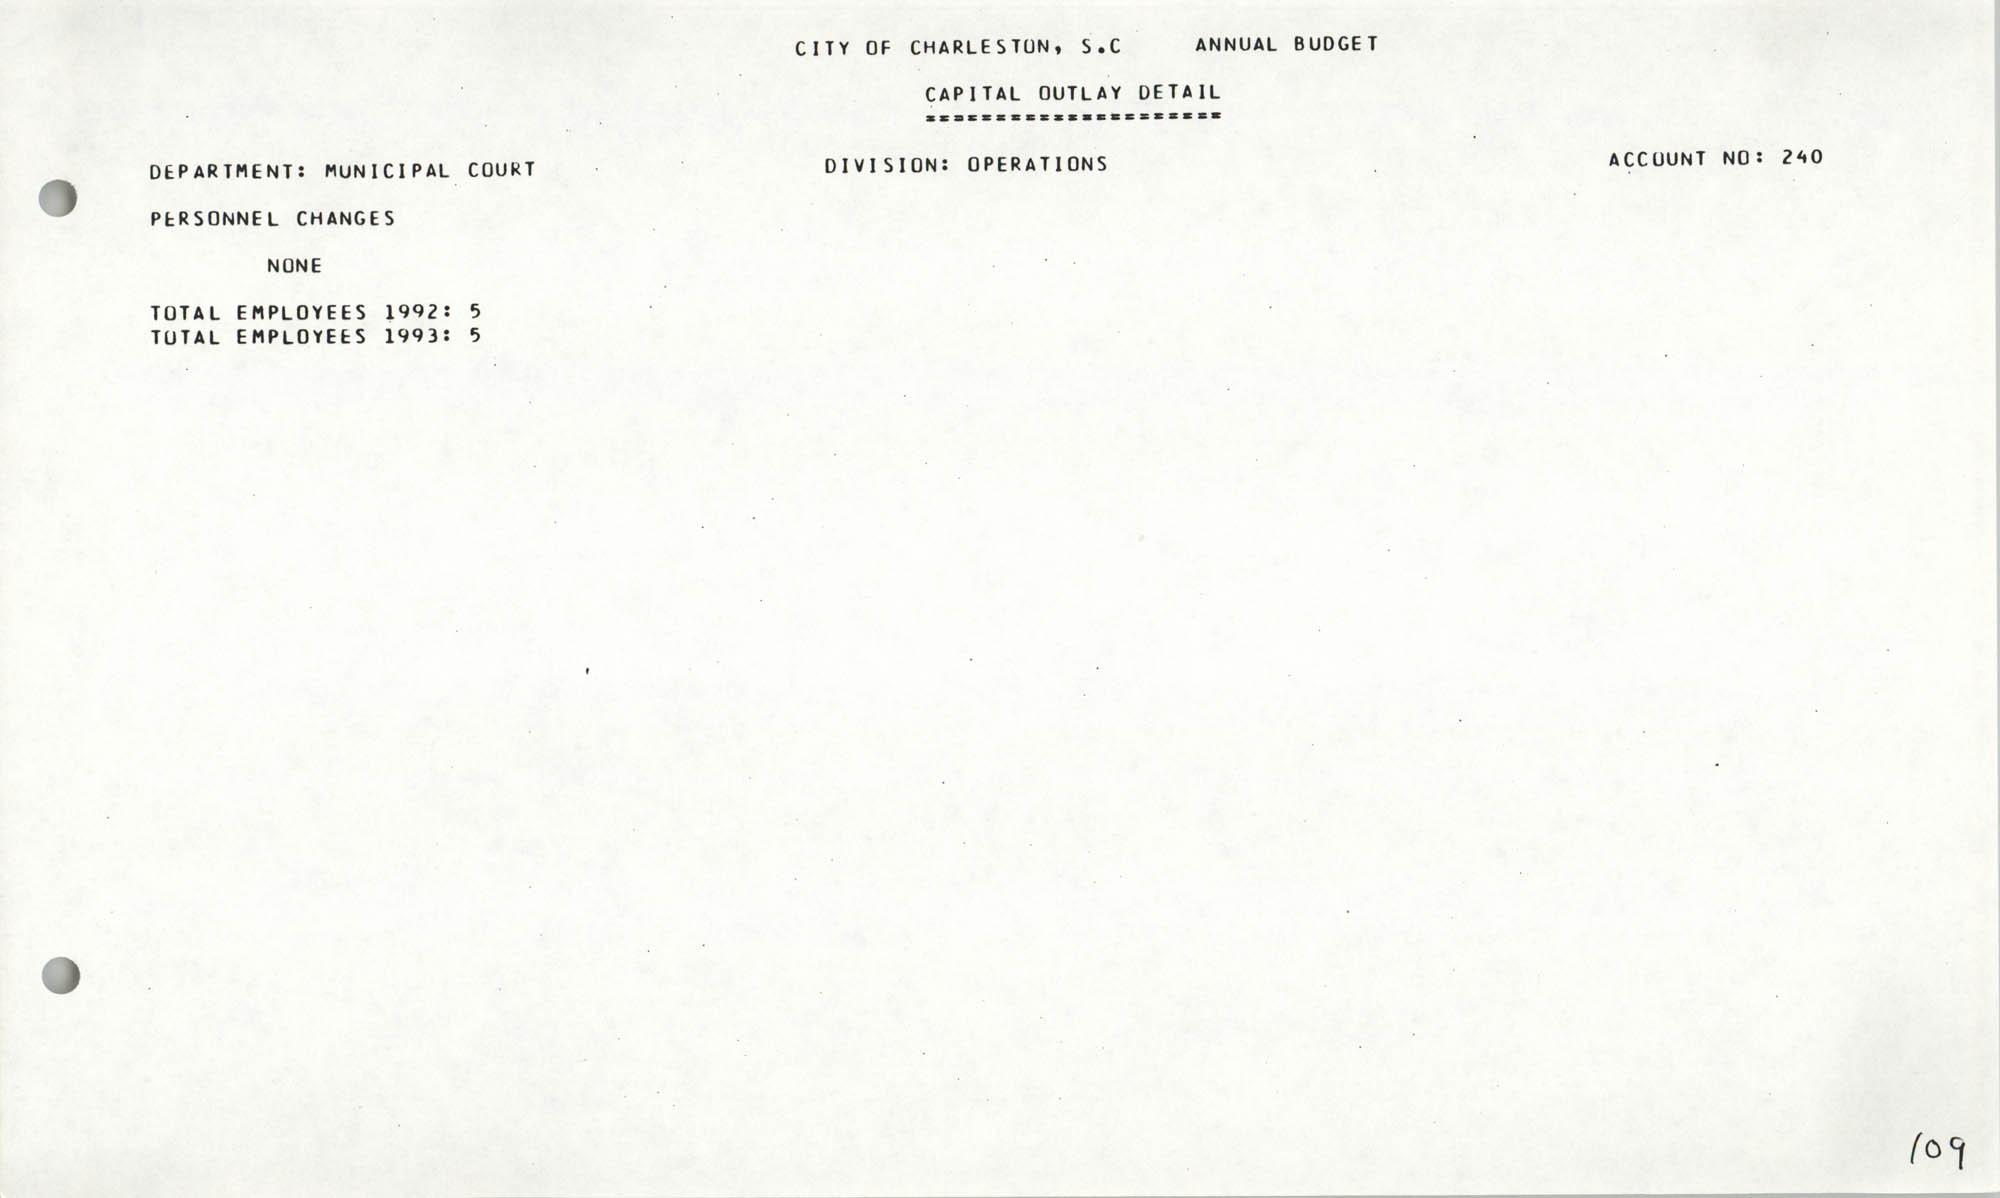 The City Council of Charleston, South Carolina, 1993 Budget, Page 109